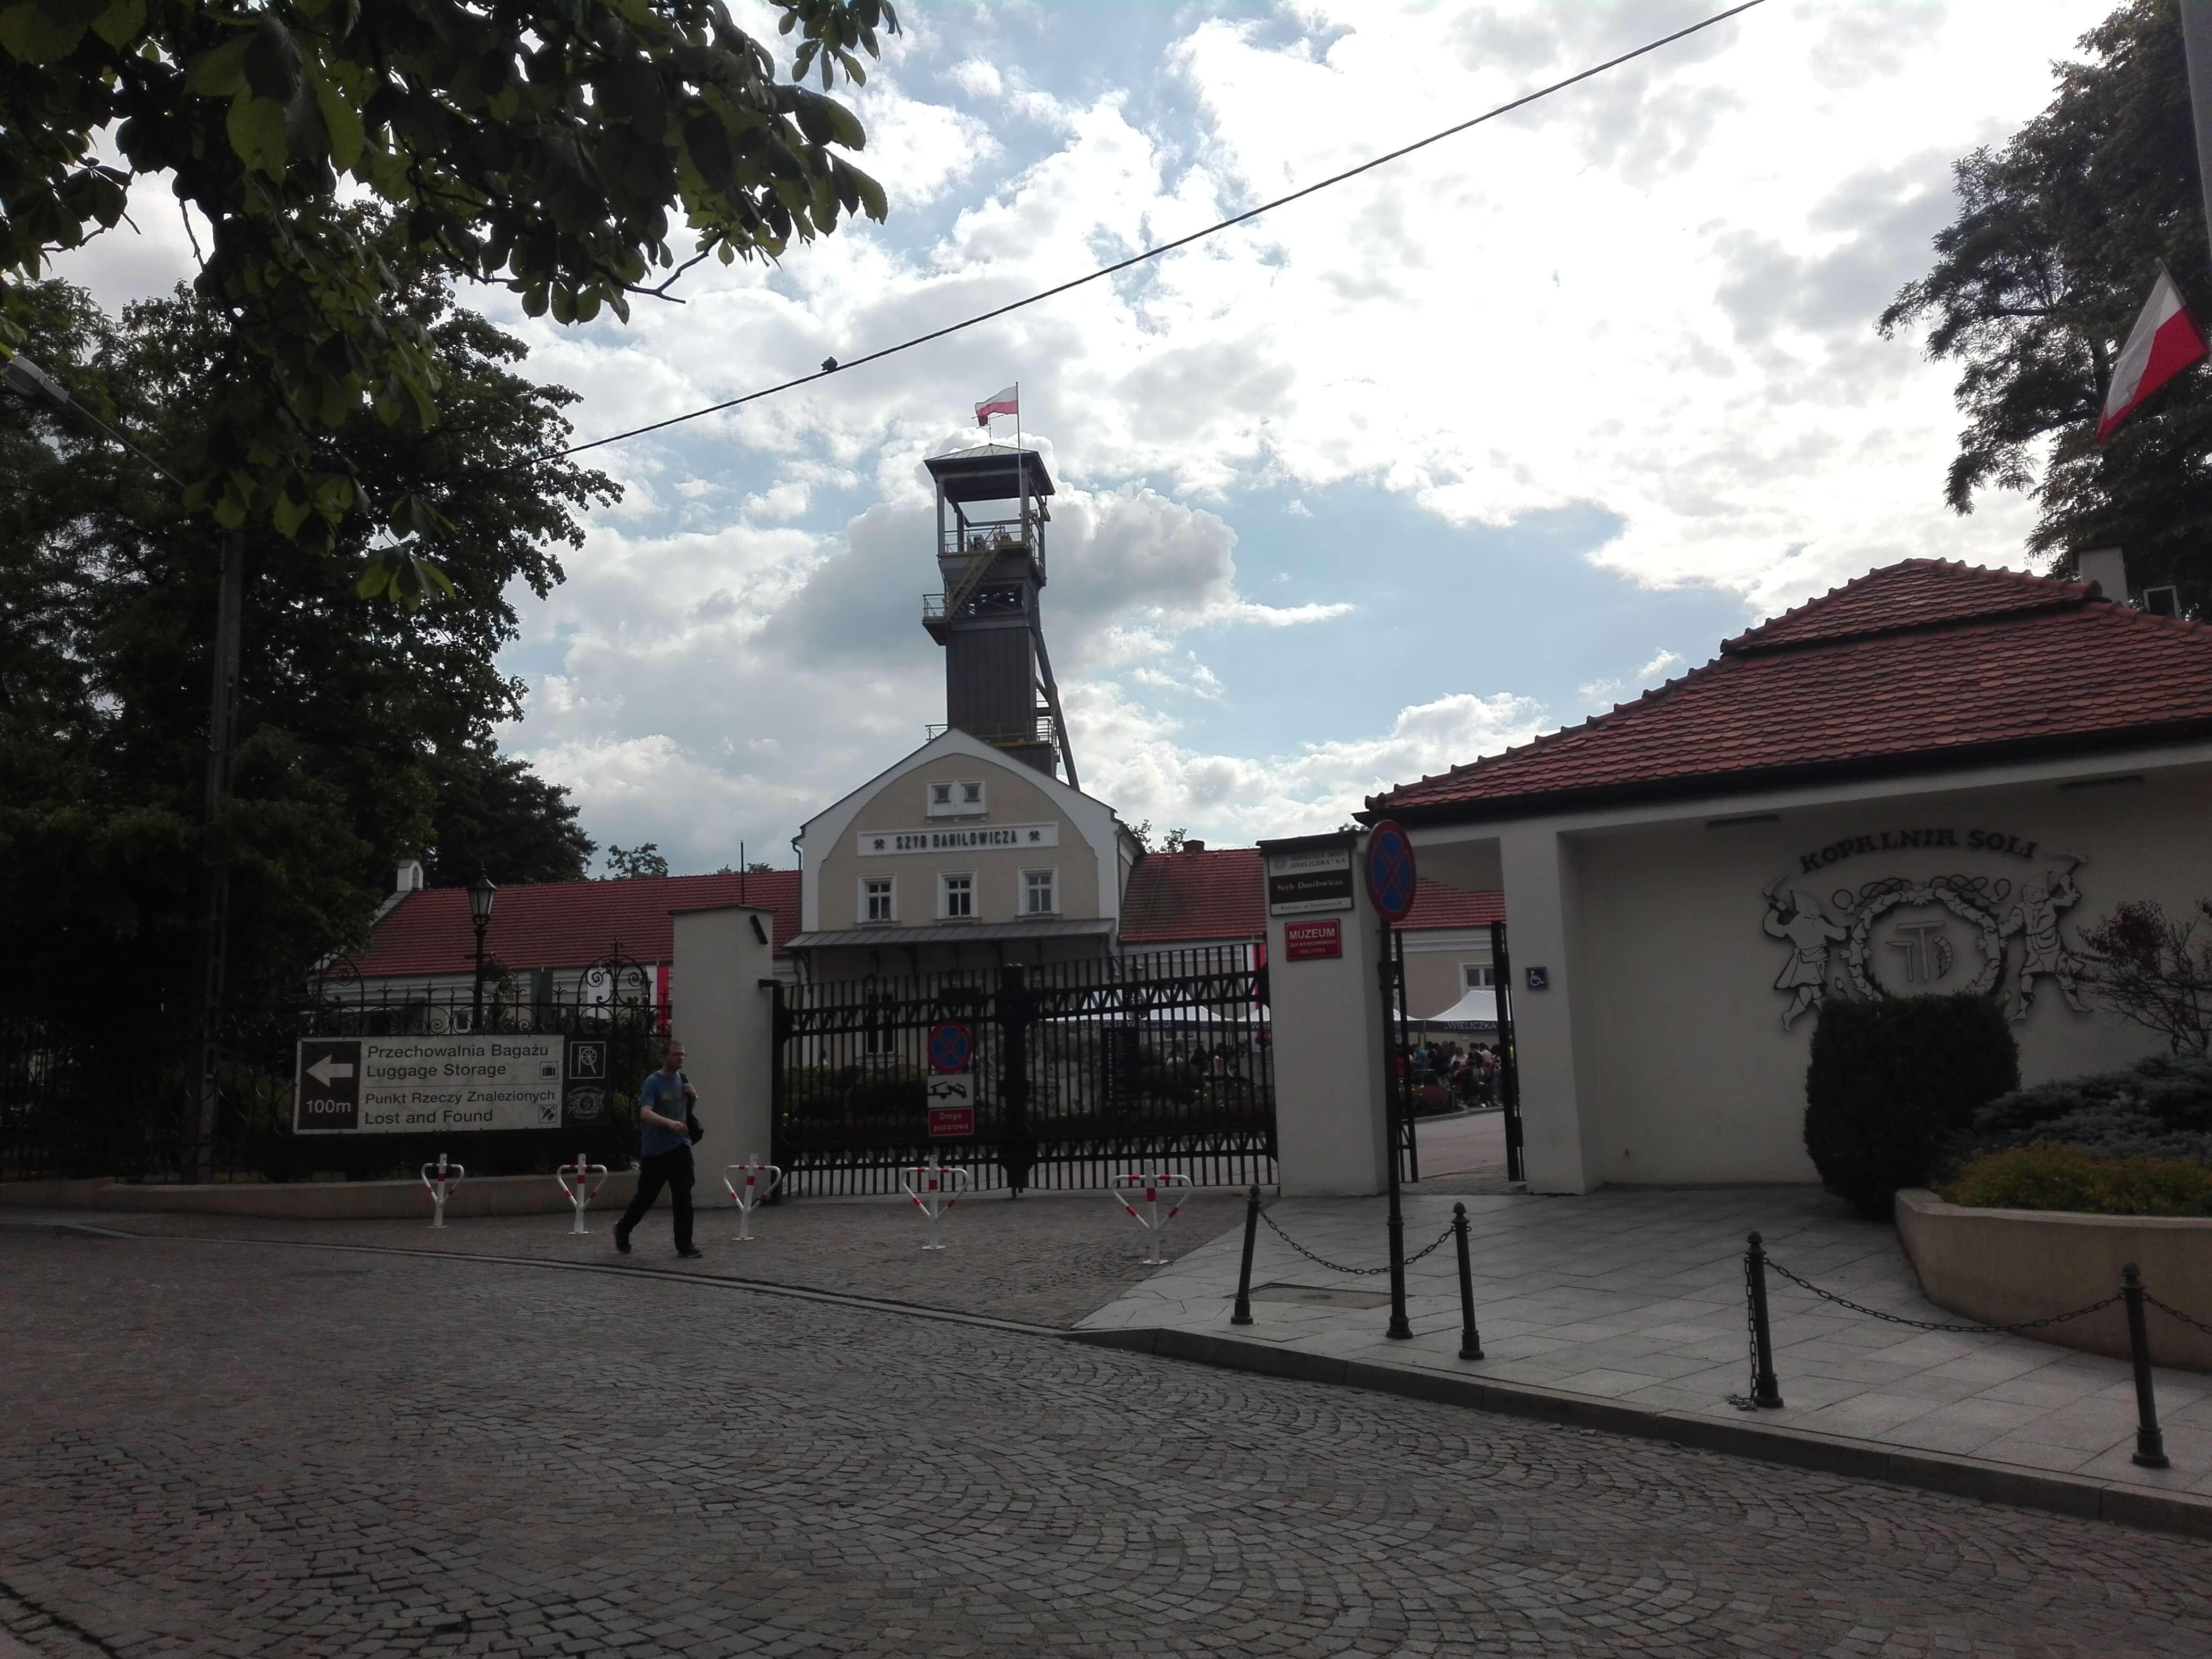 La mina de sal de Wieliczka